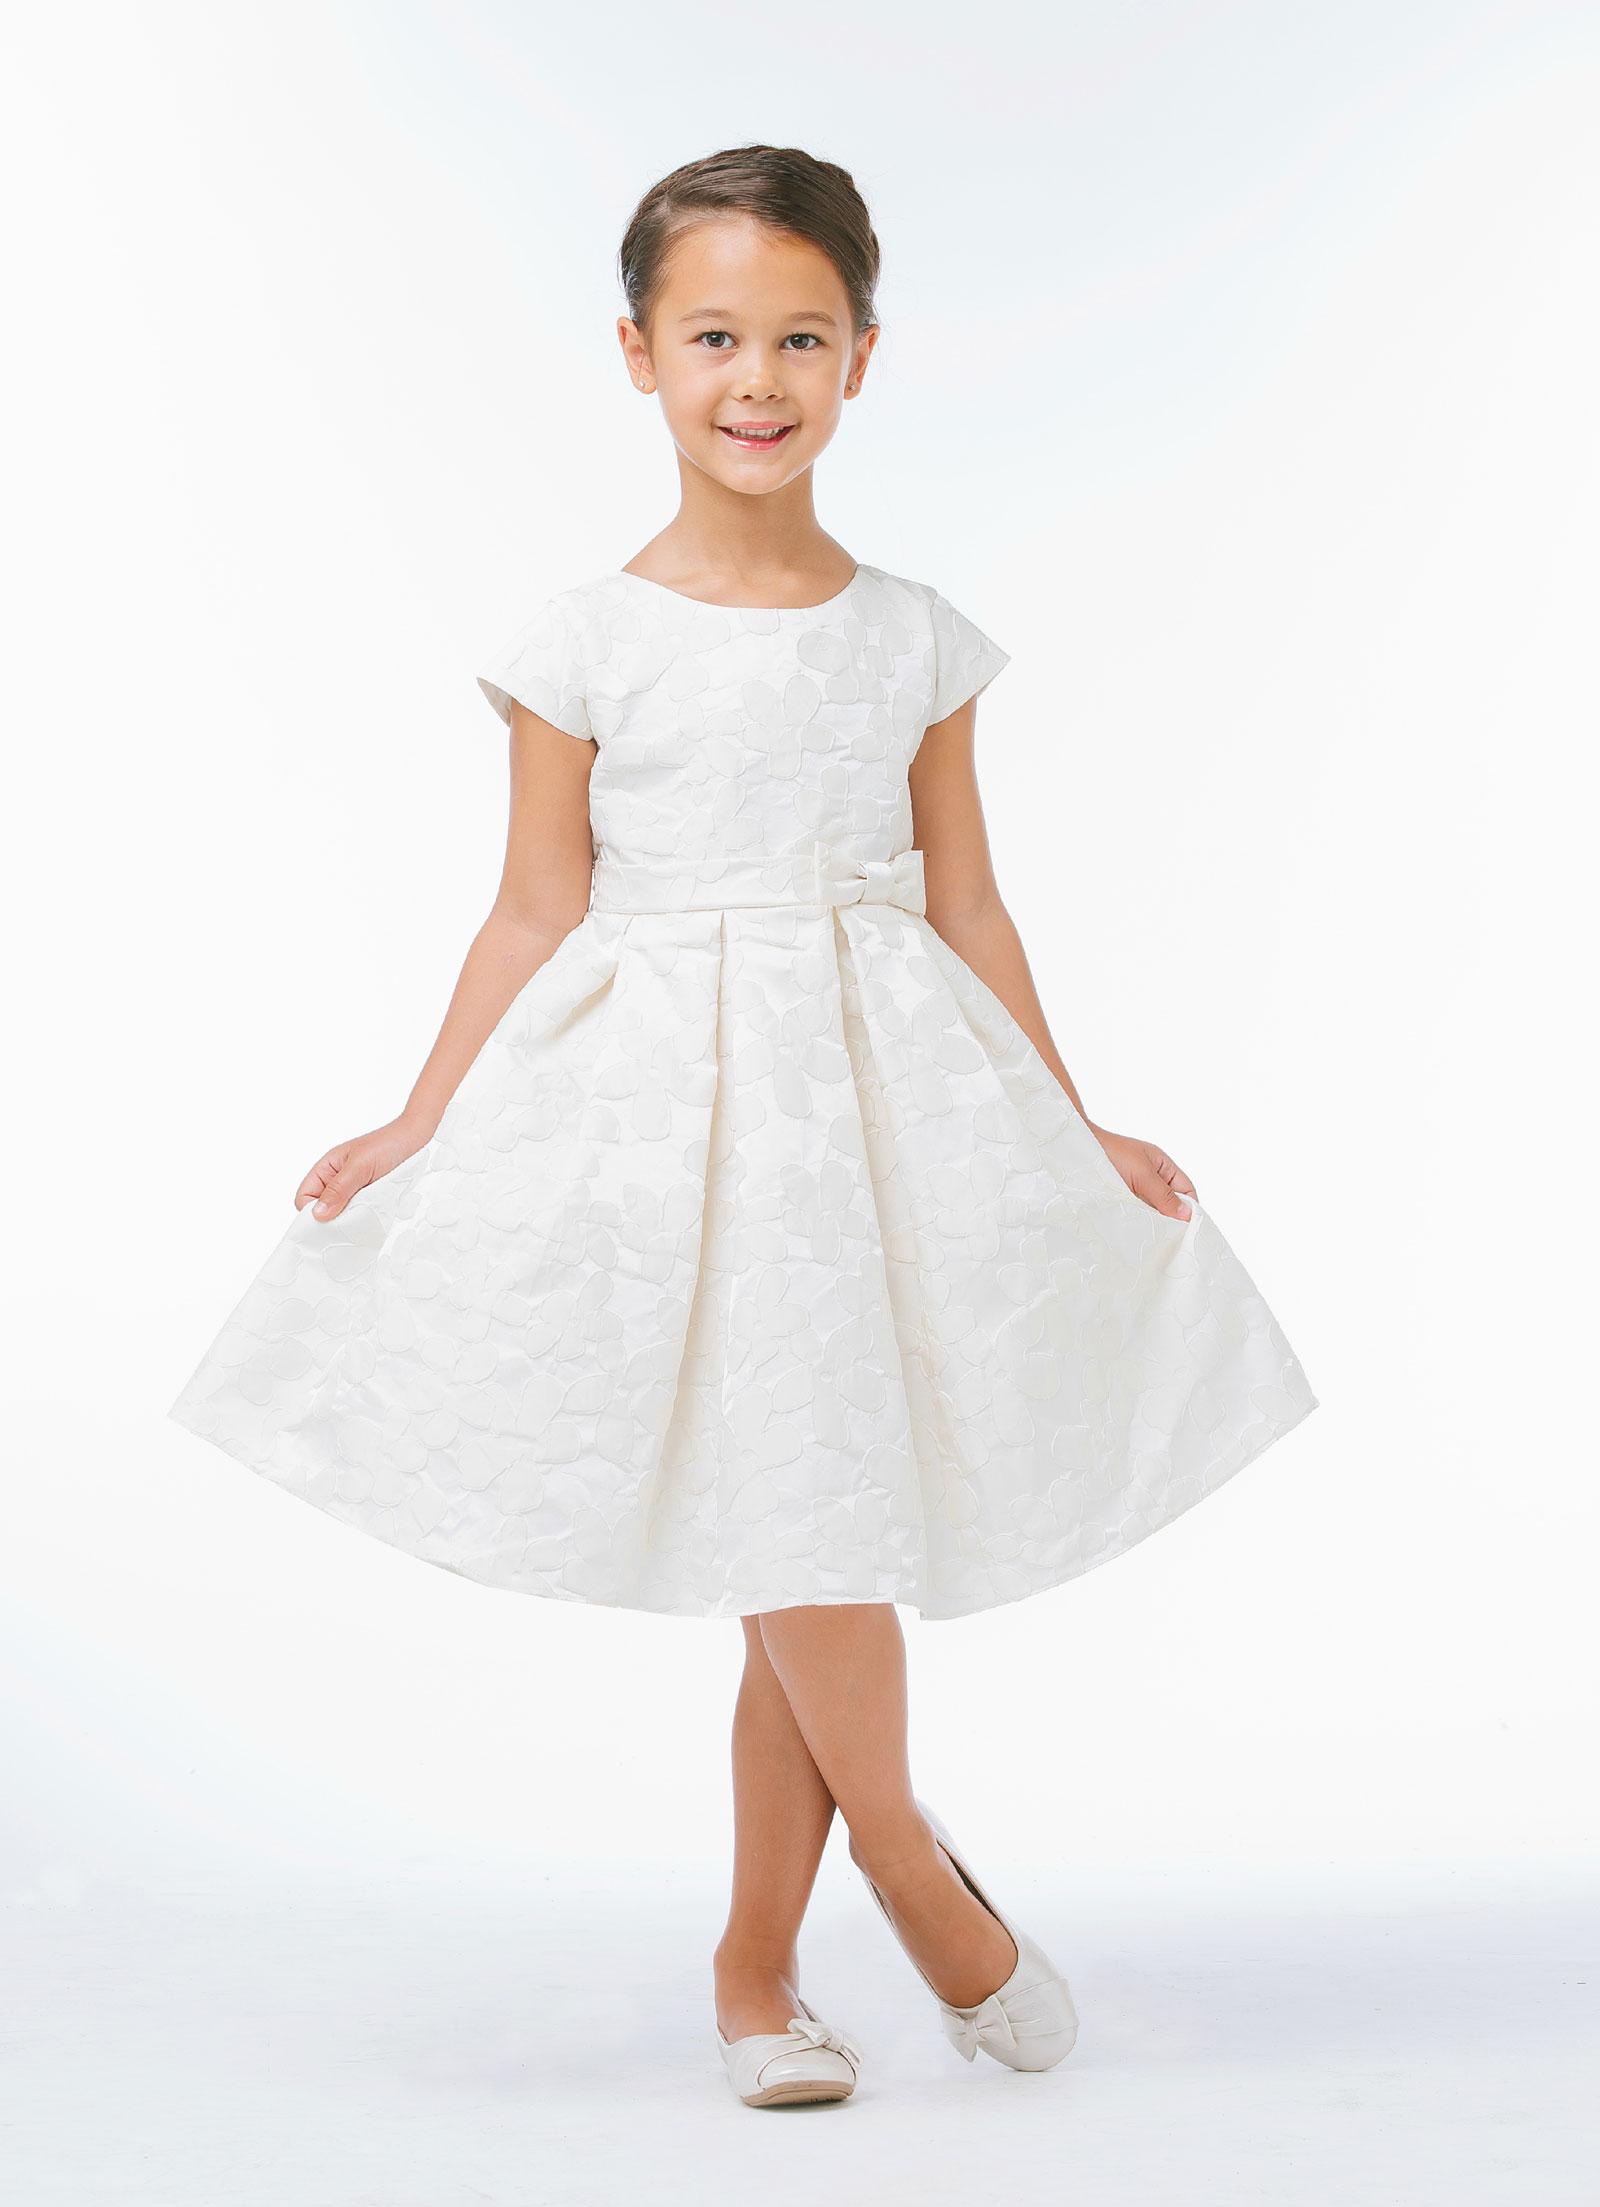 SK 625IV Girls Dress Style 625 Cap Sleeve Daisy Inspired Dress in Choice